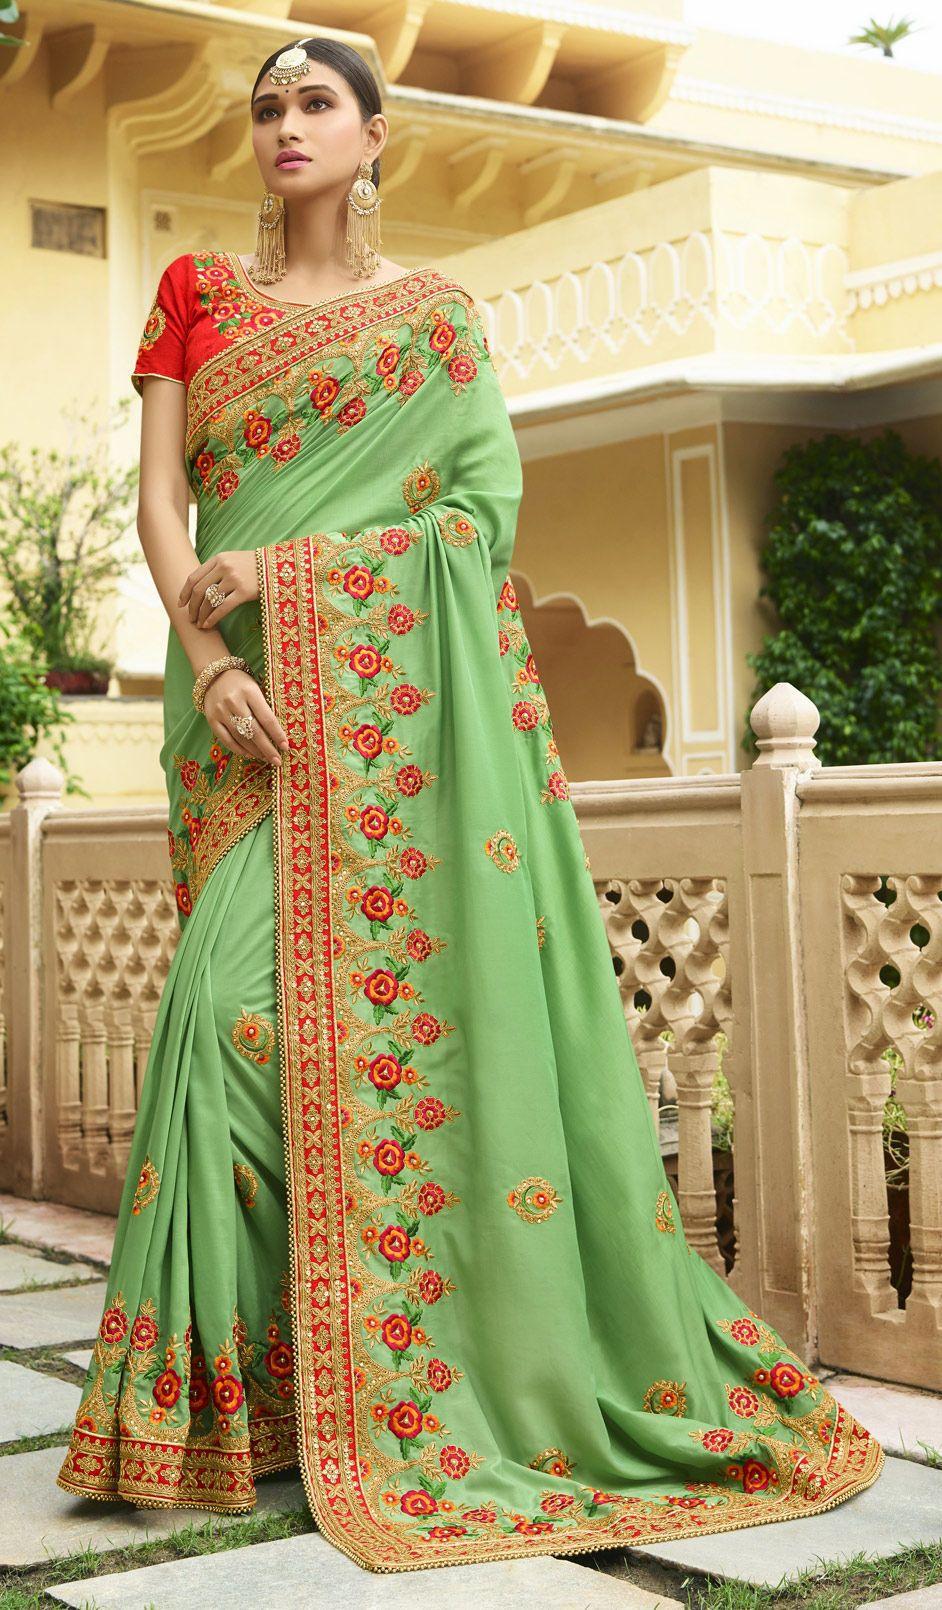 ecaefb5ac9 1521934: Traditional Green color Saree in Art Silk, Silk fabric with Border,  Bugle Beads, Embroidered, Resham, Thread, Zari work